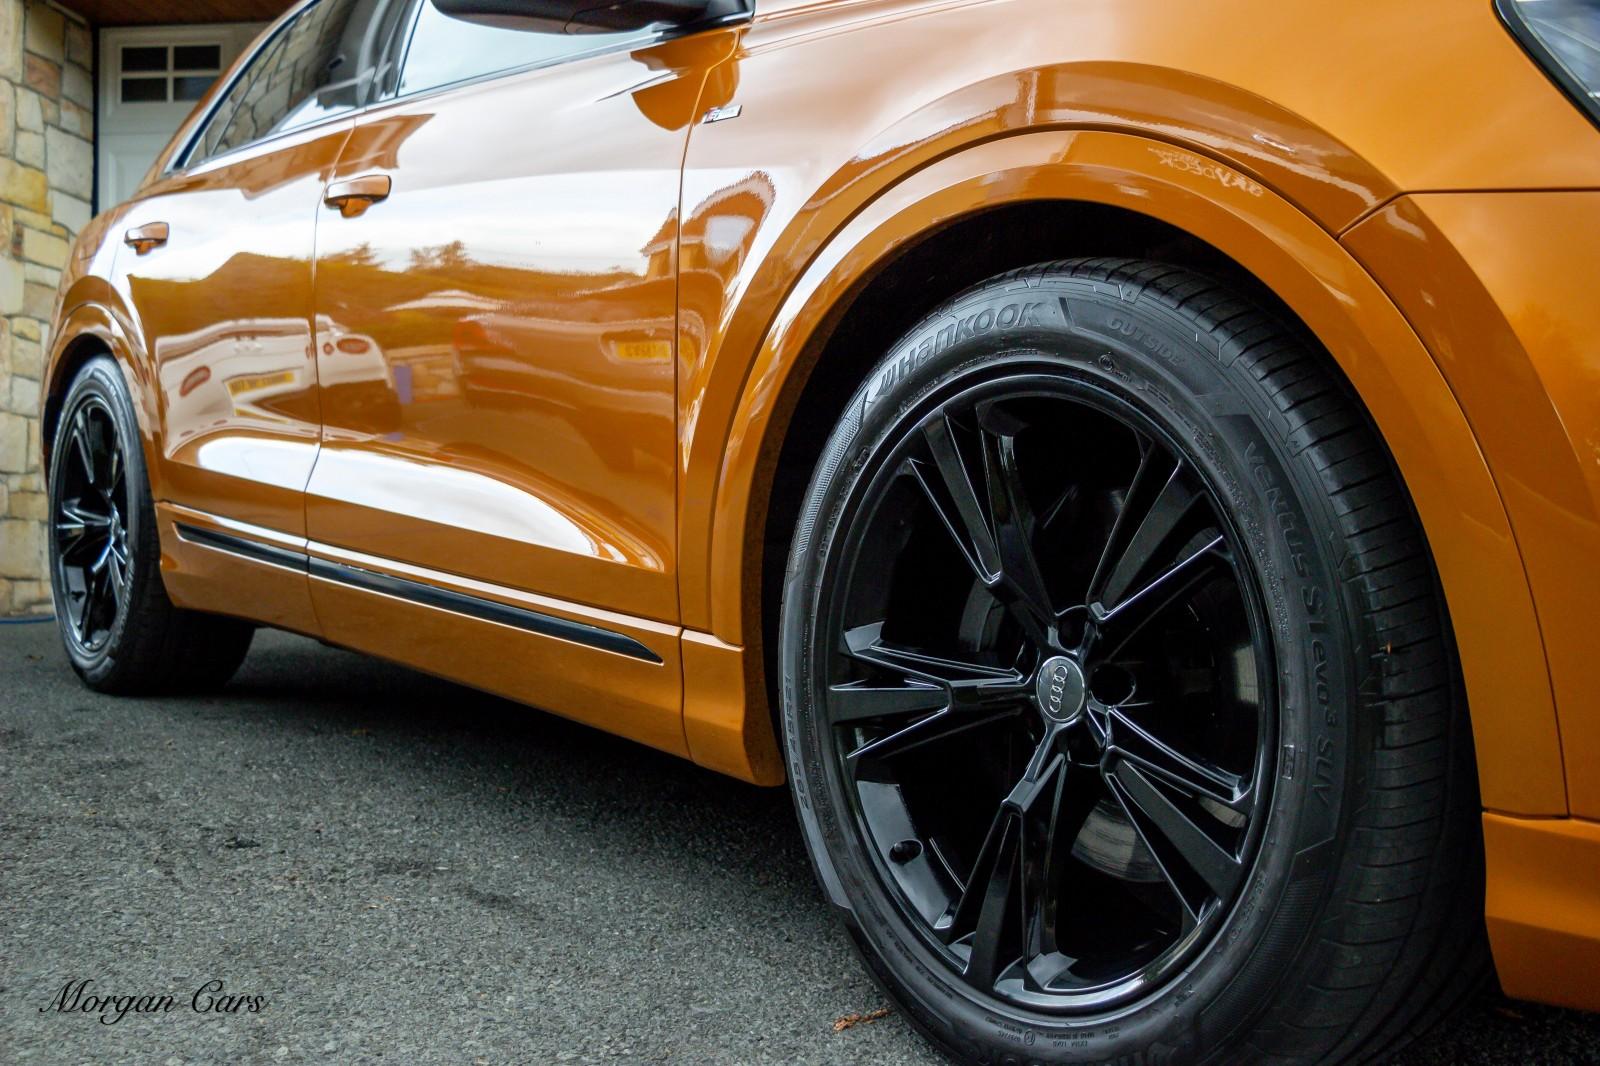 2019 Audi Q8 3.0 TDI QUATTRO S LINE Diesel Automatic – Morgan Cars 9 Mound Road, Warrenpoint, Newry BT34 3LW, UK full